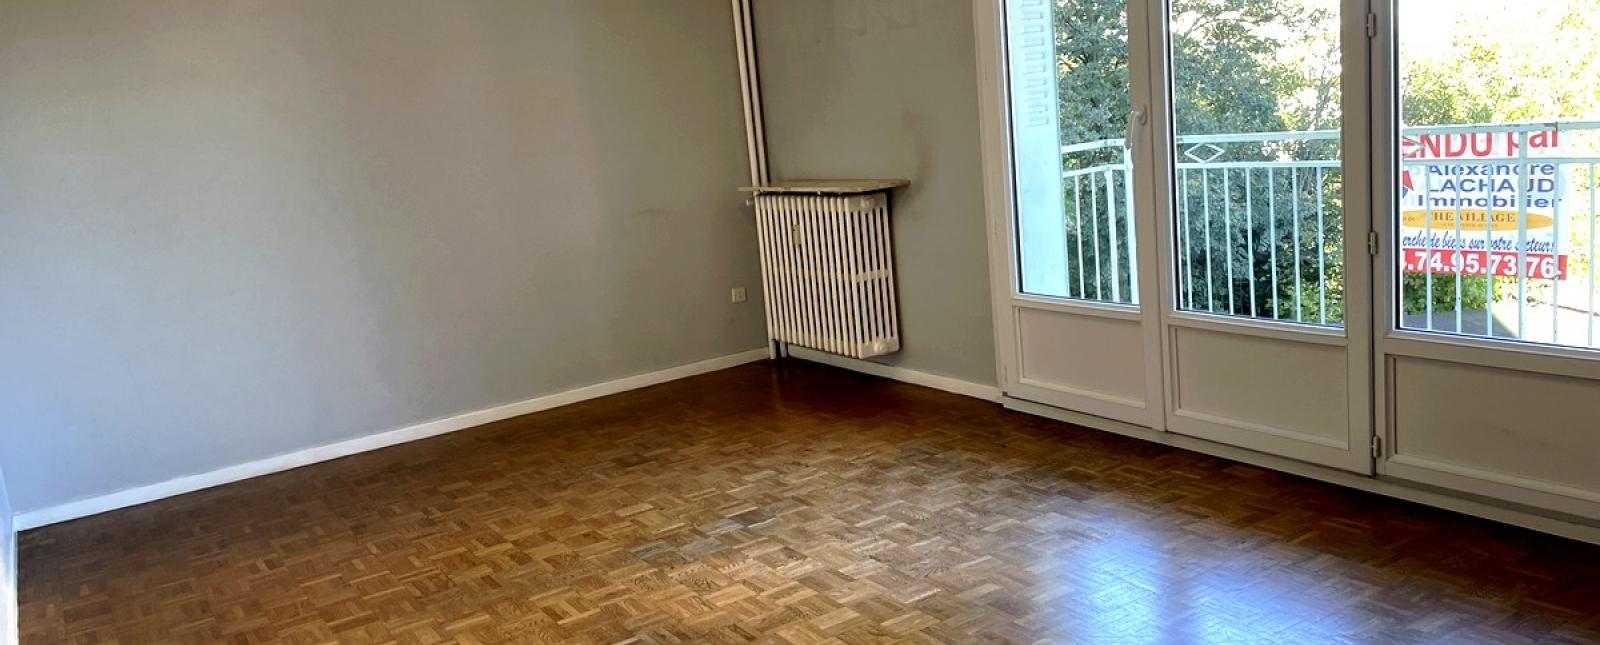 Maison / Villa 92, Villefontaine